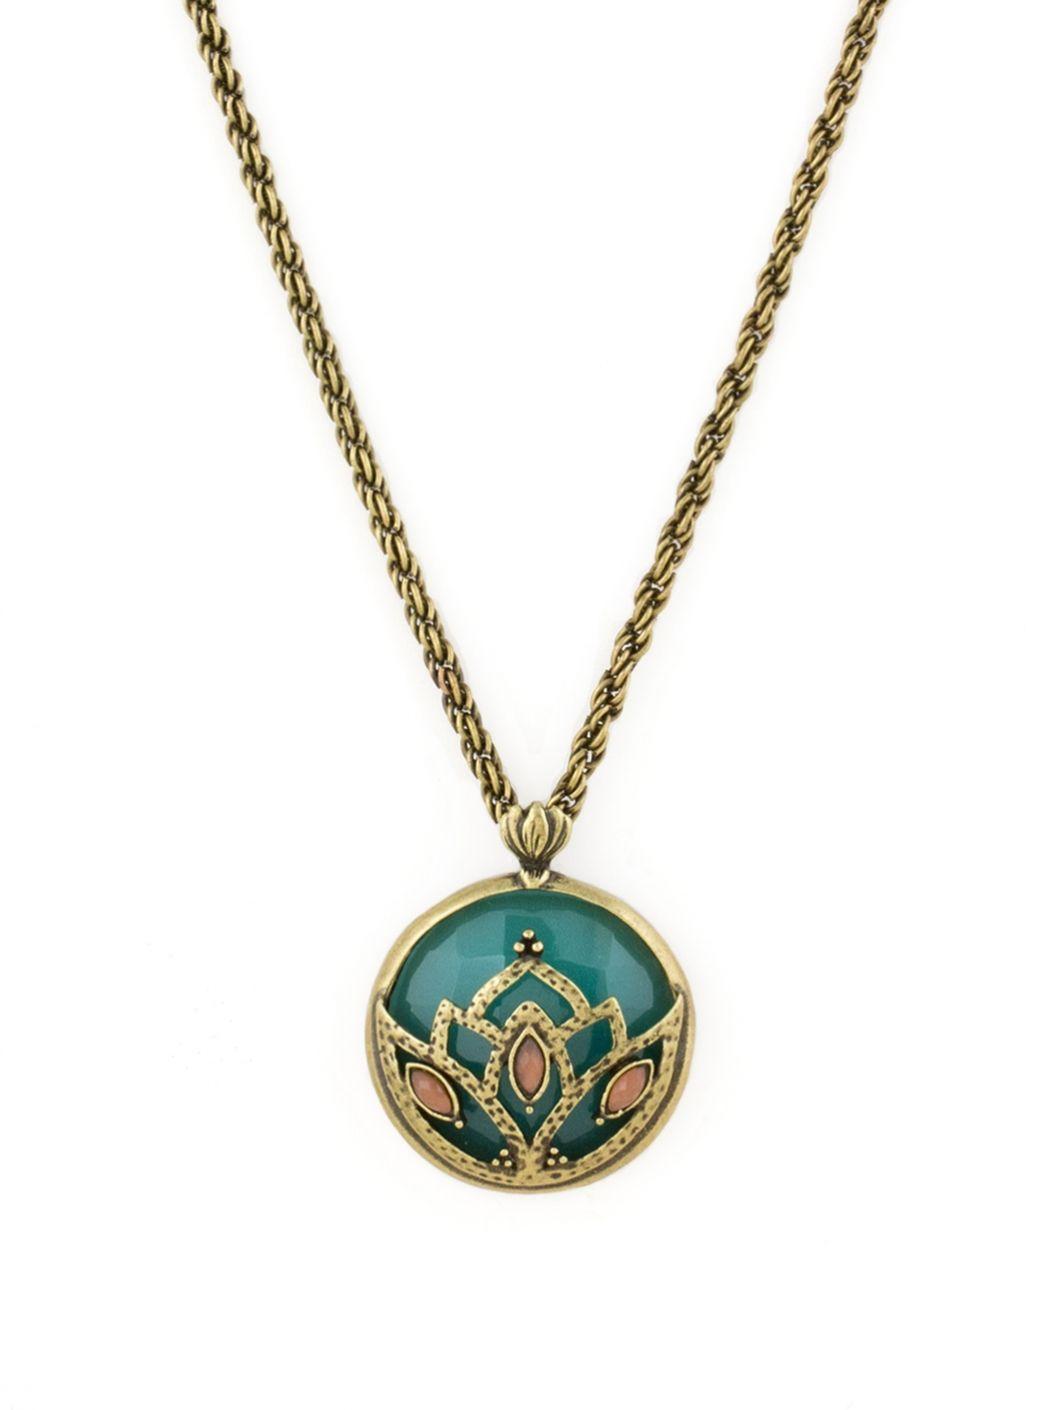 6f88751005da65 Jade Lotus Pendant | New Arrivals, Greens & Blues, Necklaces, Pendants,  BOHO Chic | AMY O. Jewelry